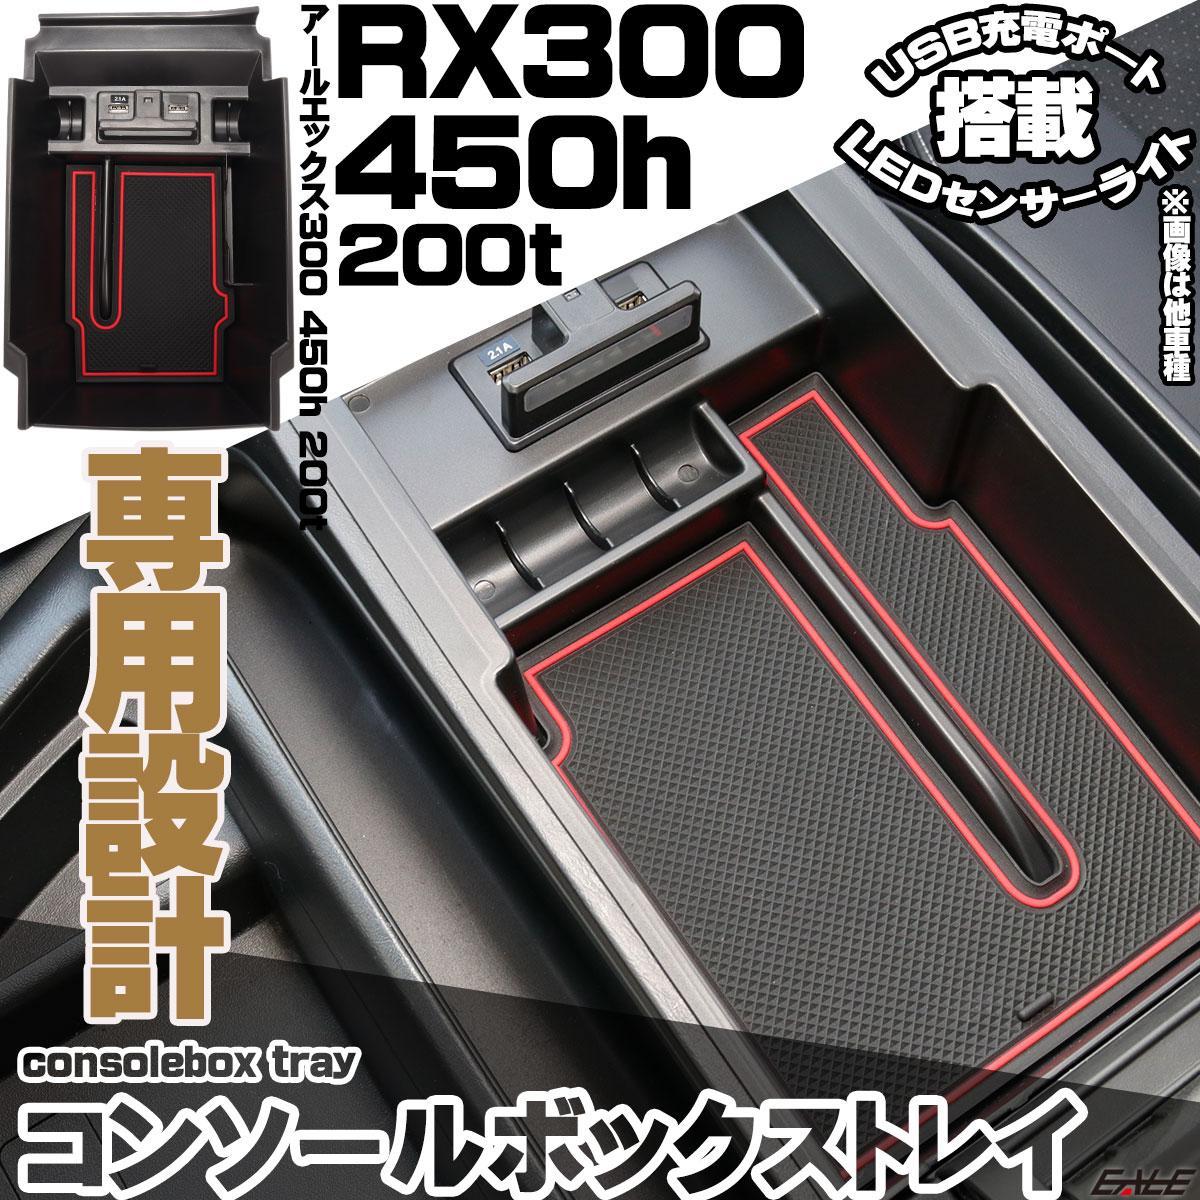 RX200t 450h 専用設計 センター コンソール ボックス トレイ USB 2ポート 急速充電 QC3.0対応 LED センサーライト 搭載 S-891